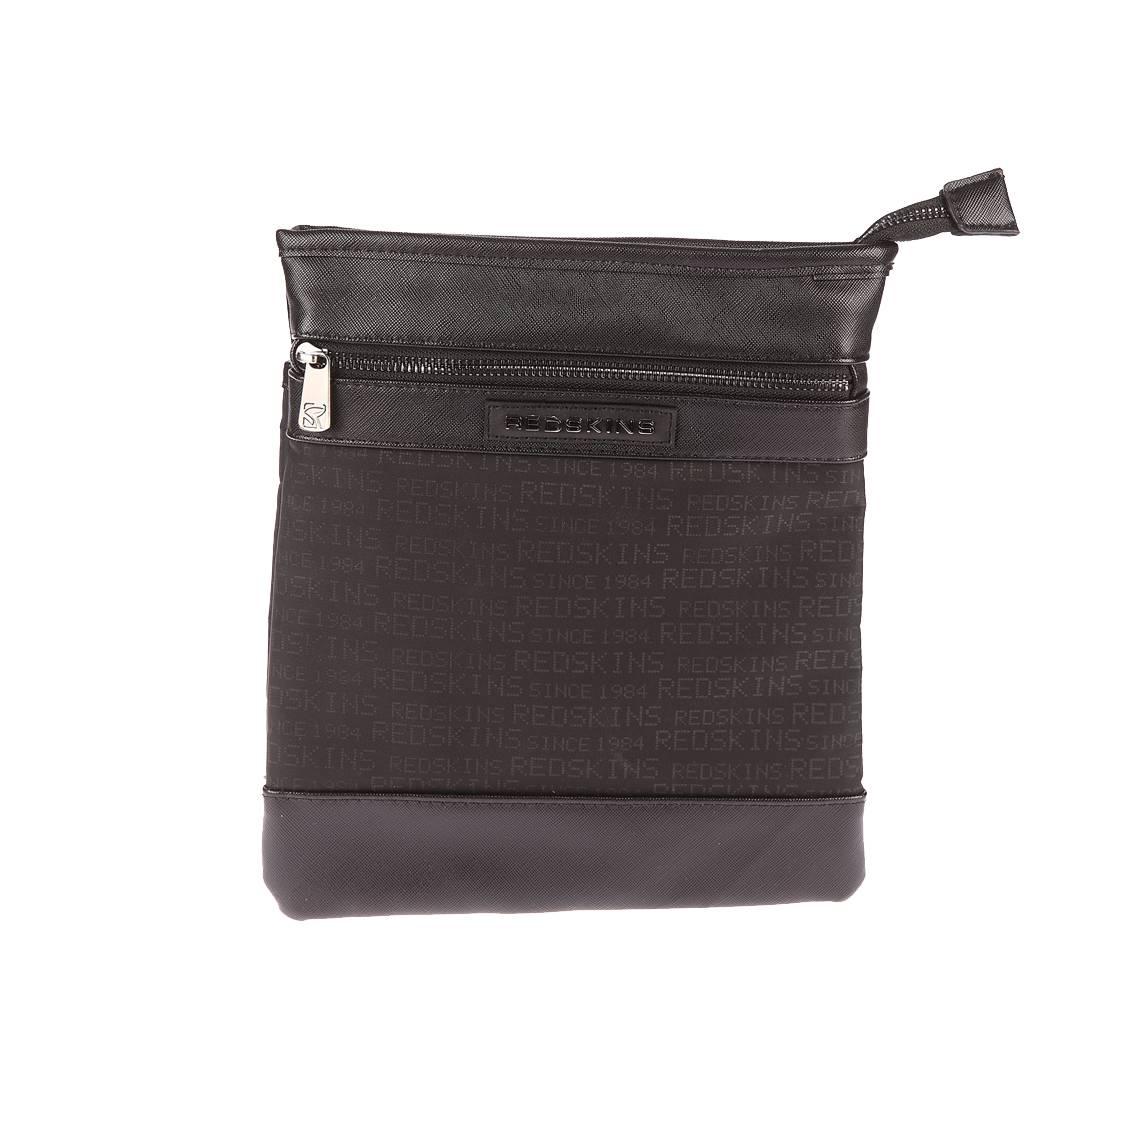 Grande sacoche plate redskins fever bi-matière imprimée noire